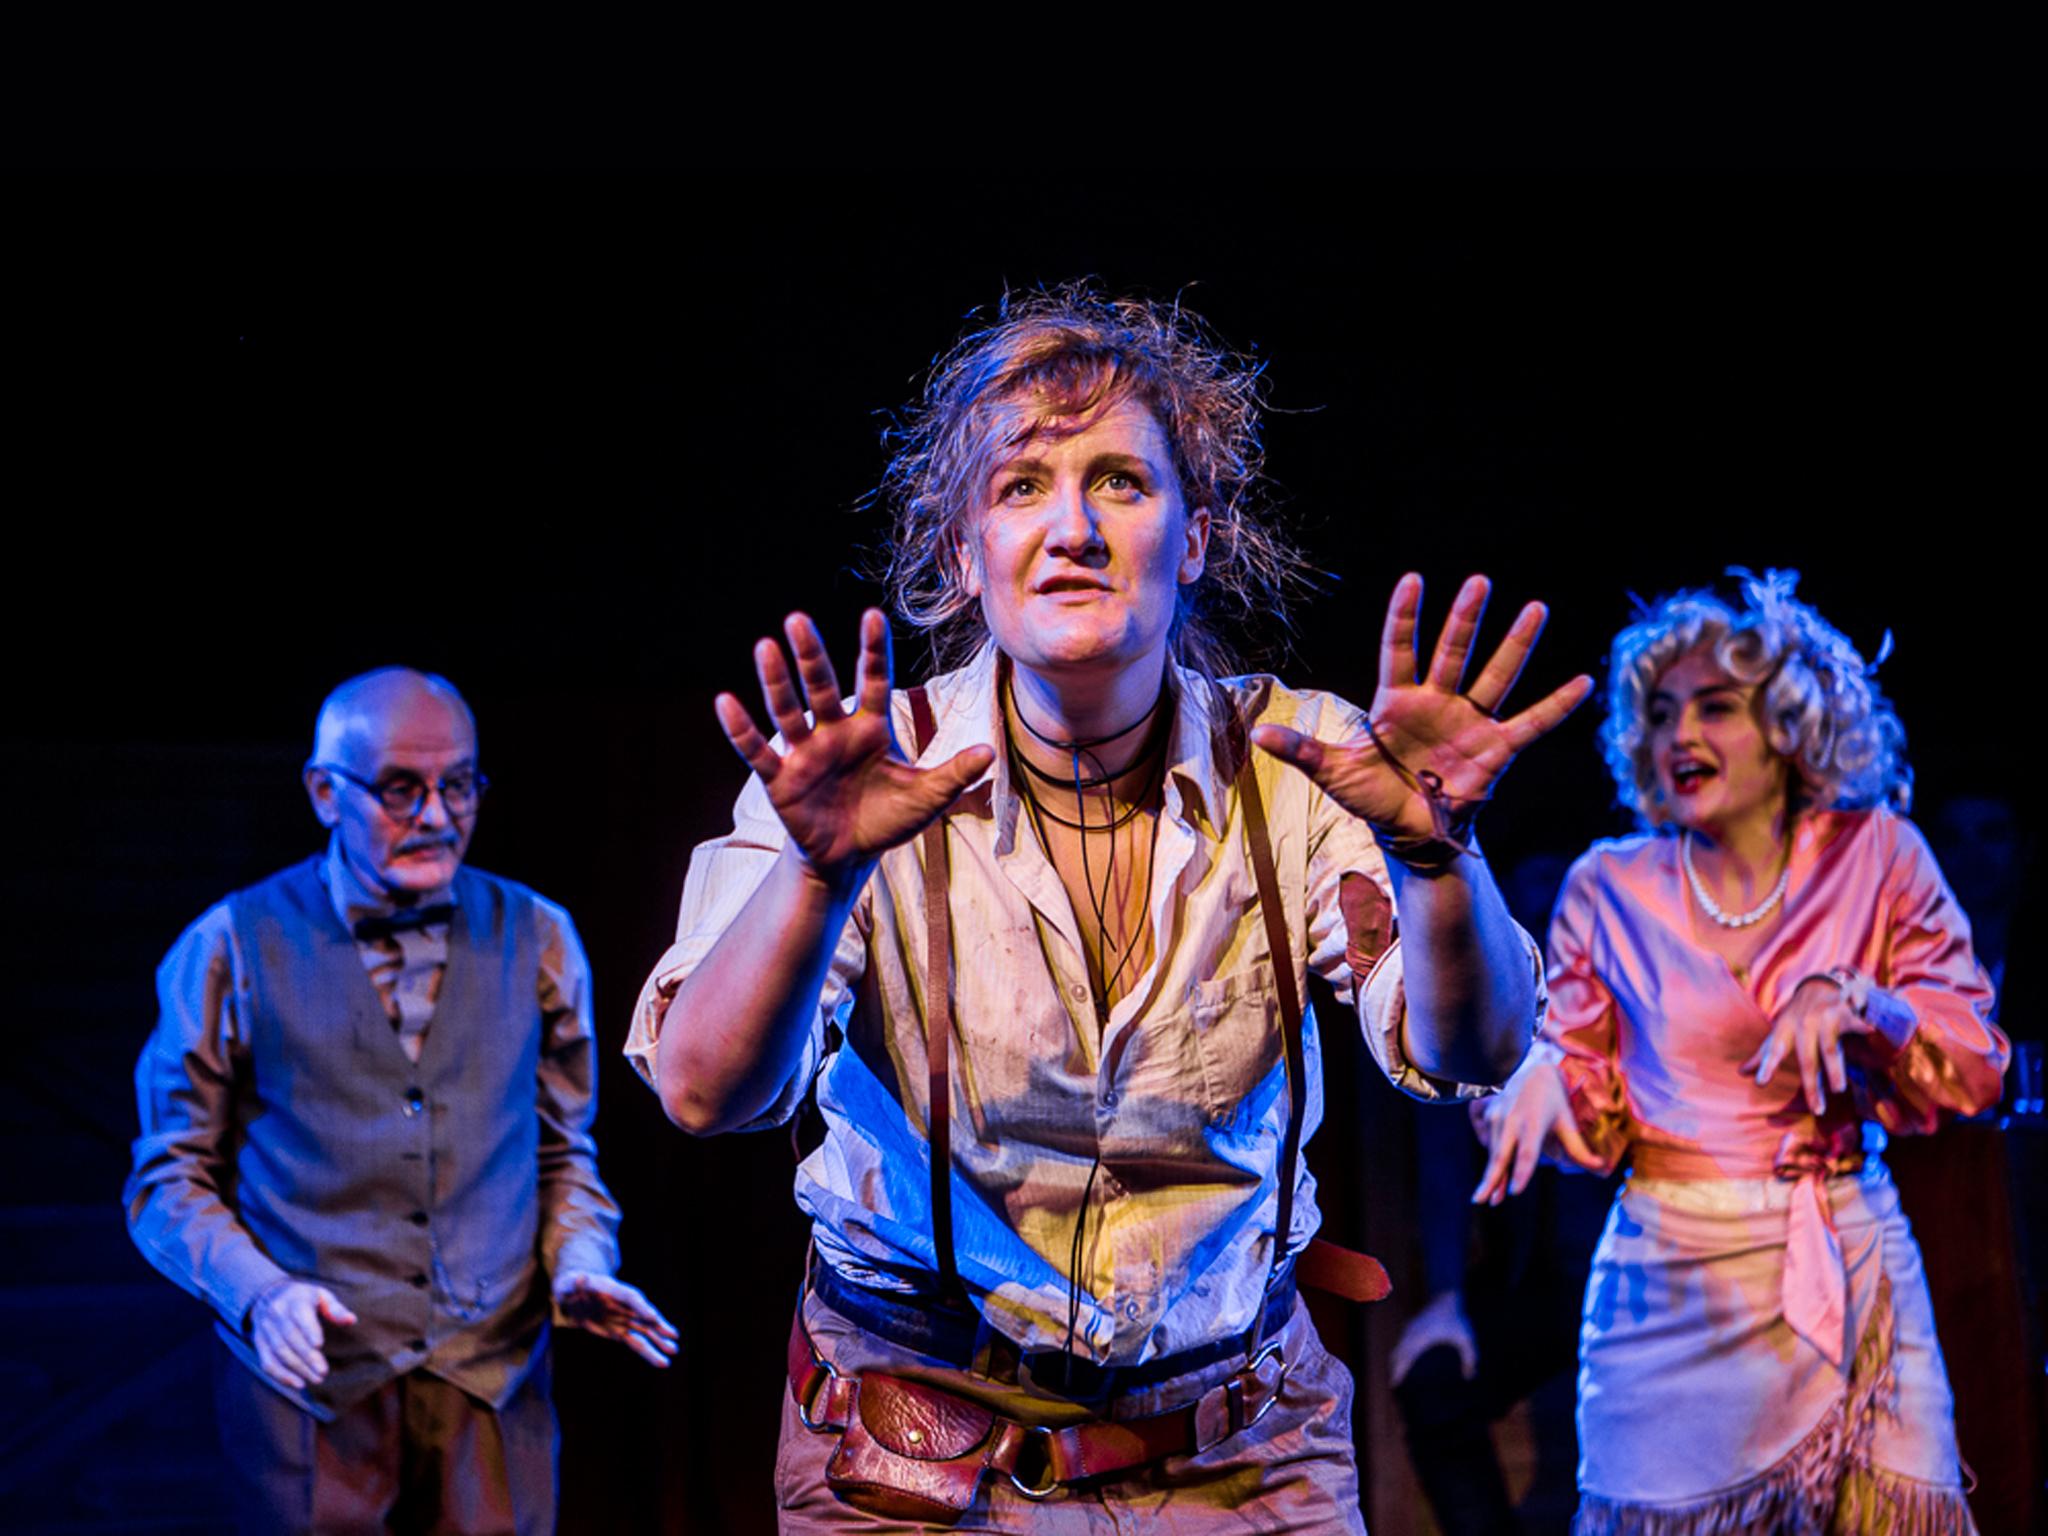 Calamity Jane 2017 Hayes Theatre production still 01 feat Tony Taylor Virginia Gay Sheridan Harbridge photographer credit John McRae